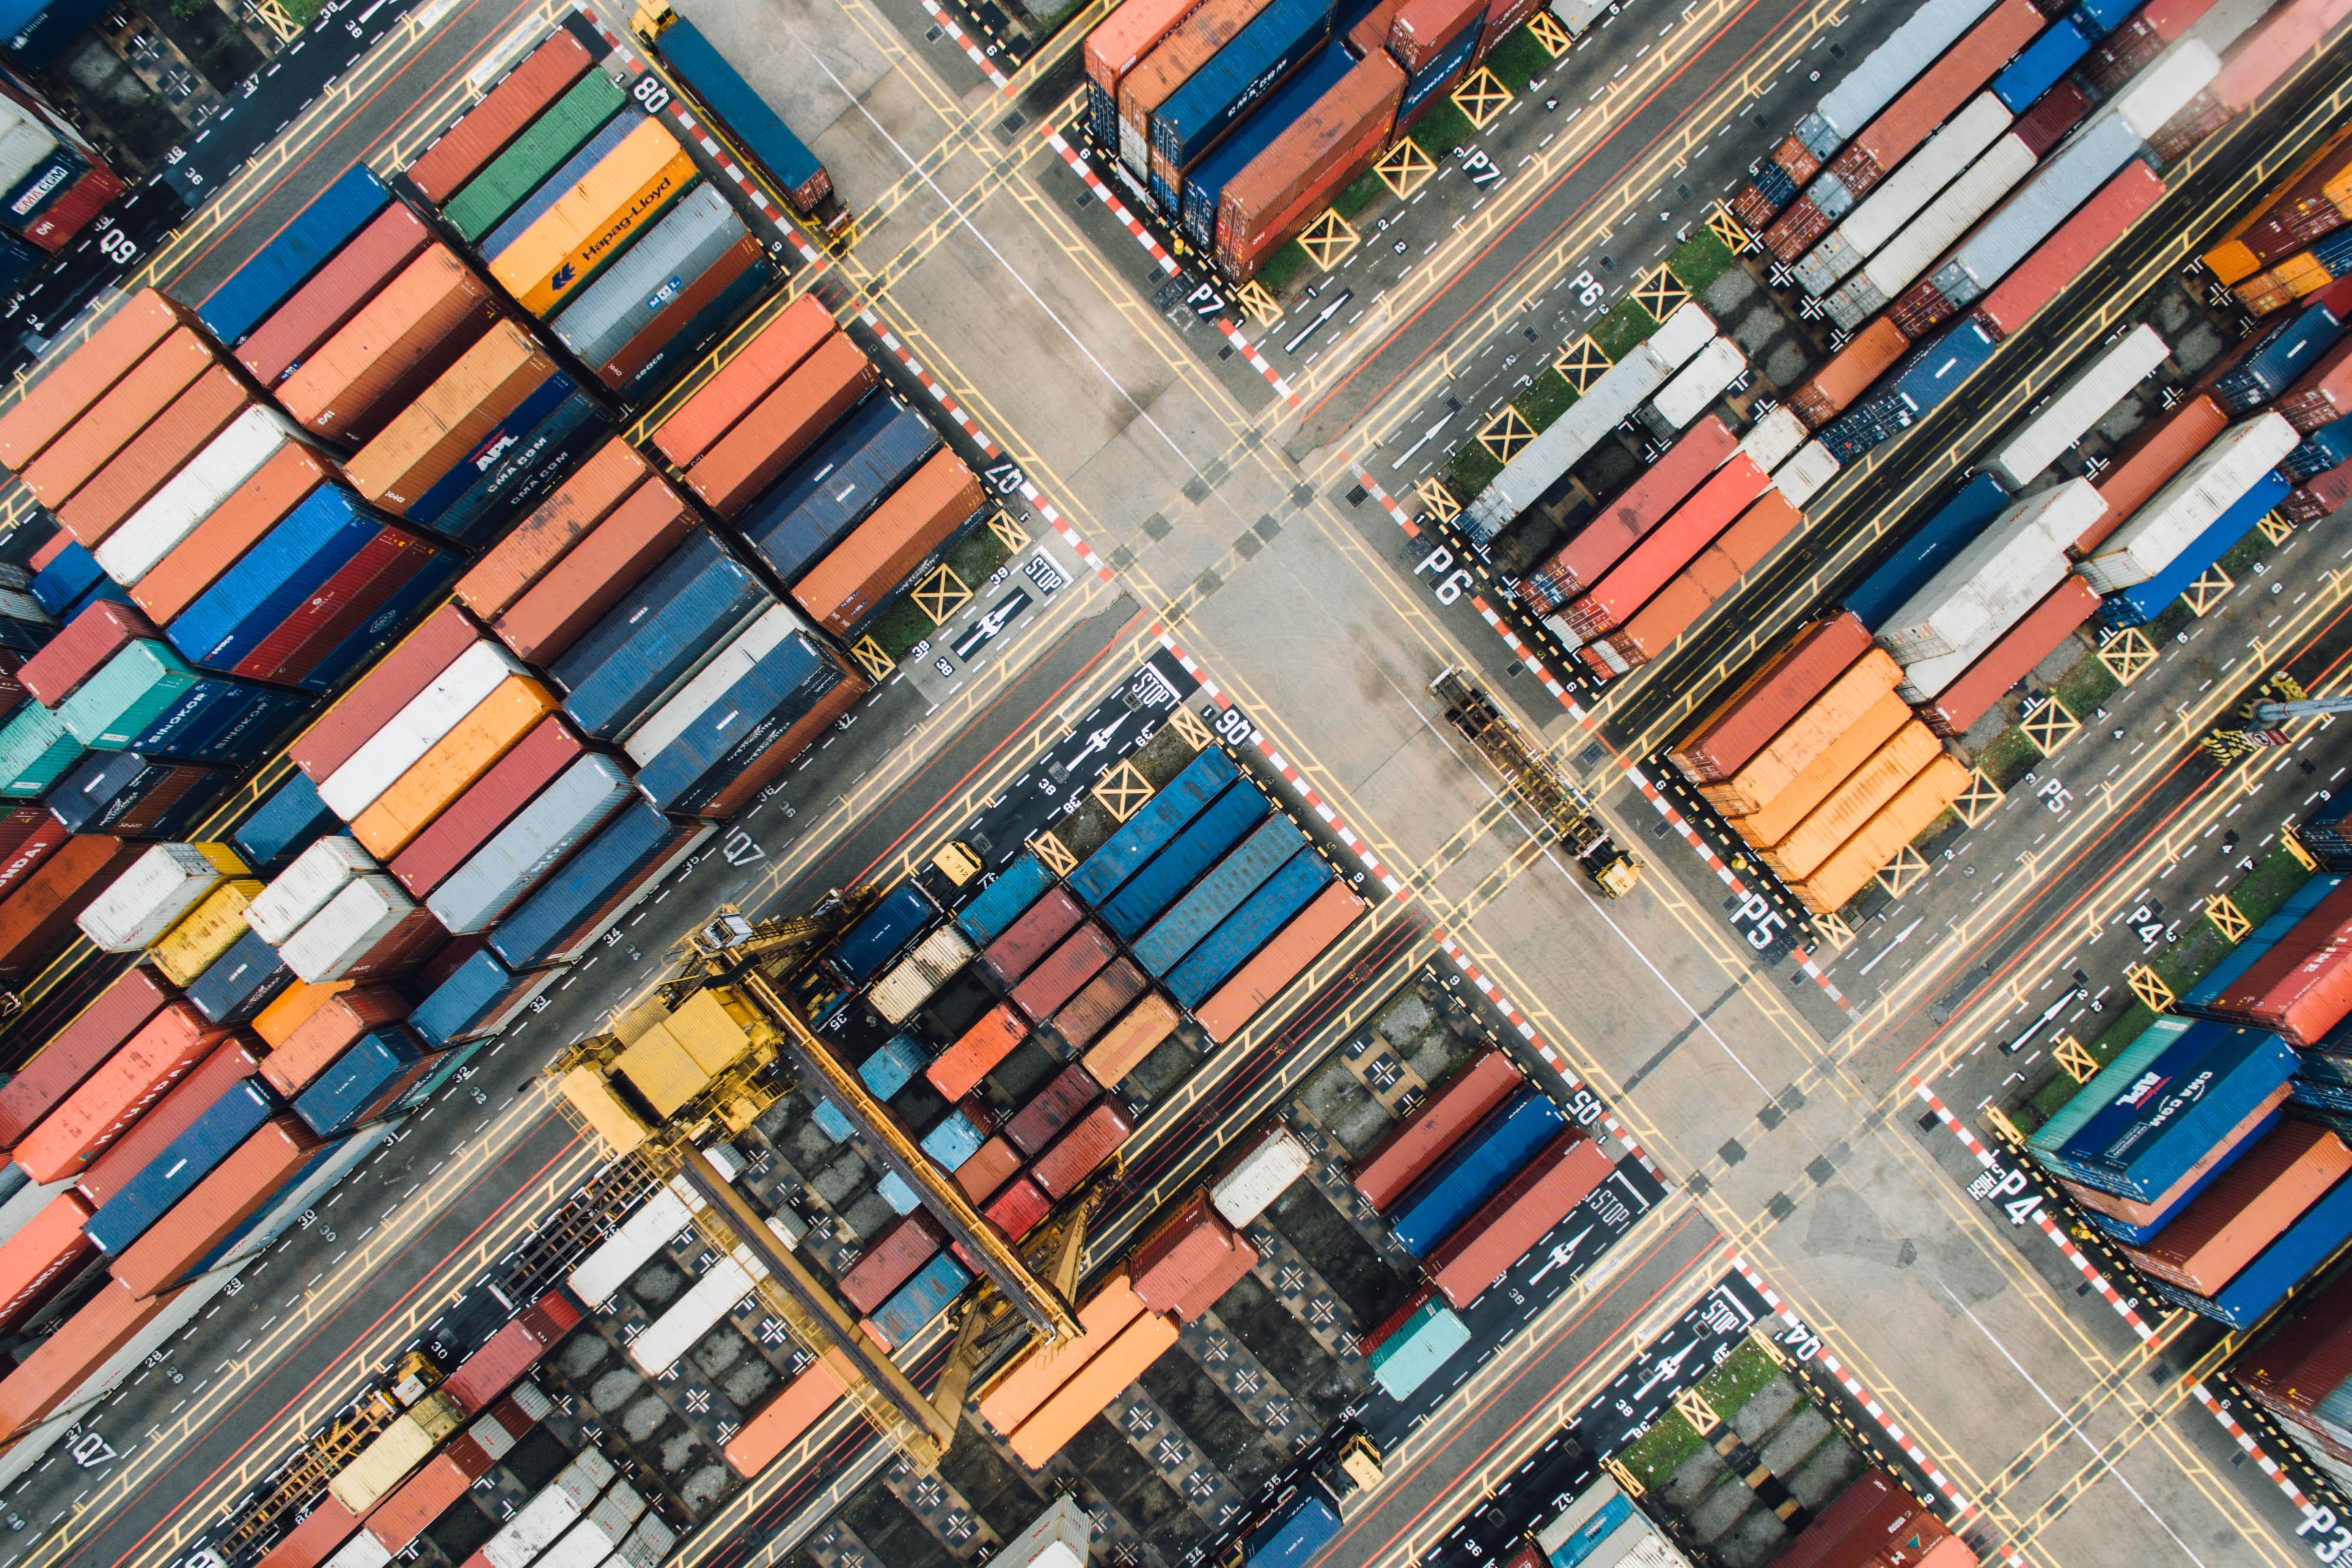 Chain Management Infrastructure